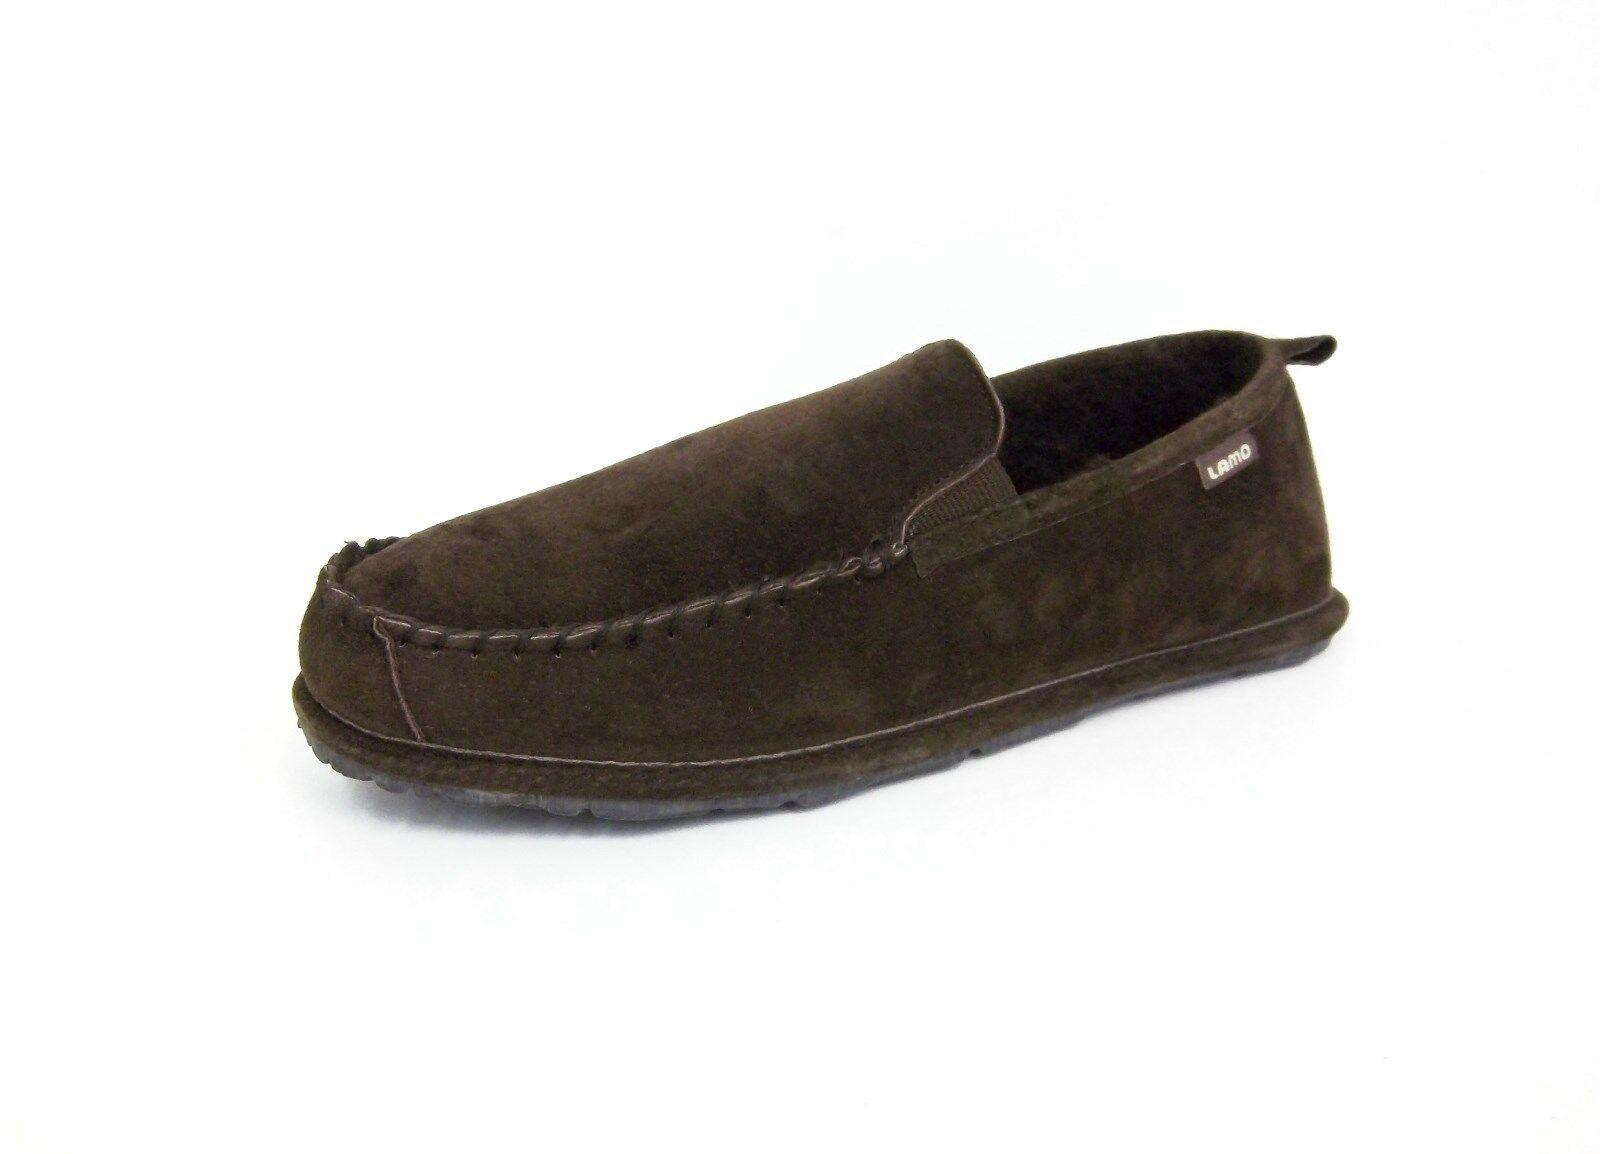 LAMO Footwear Newport Slip On Shoe muTLhuurRi